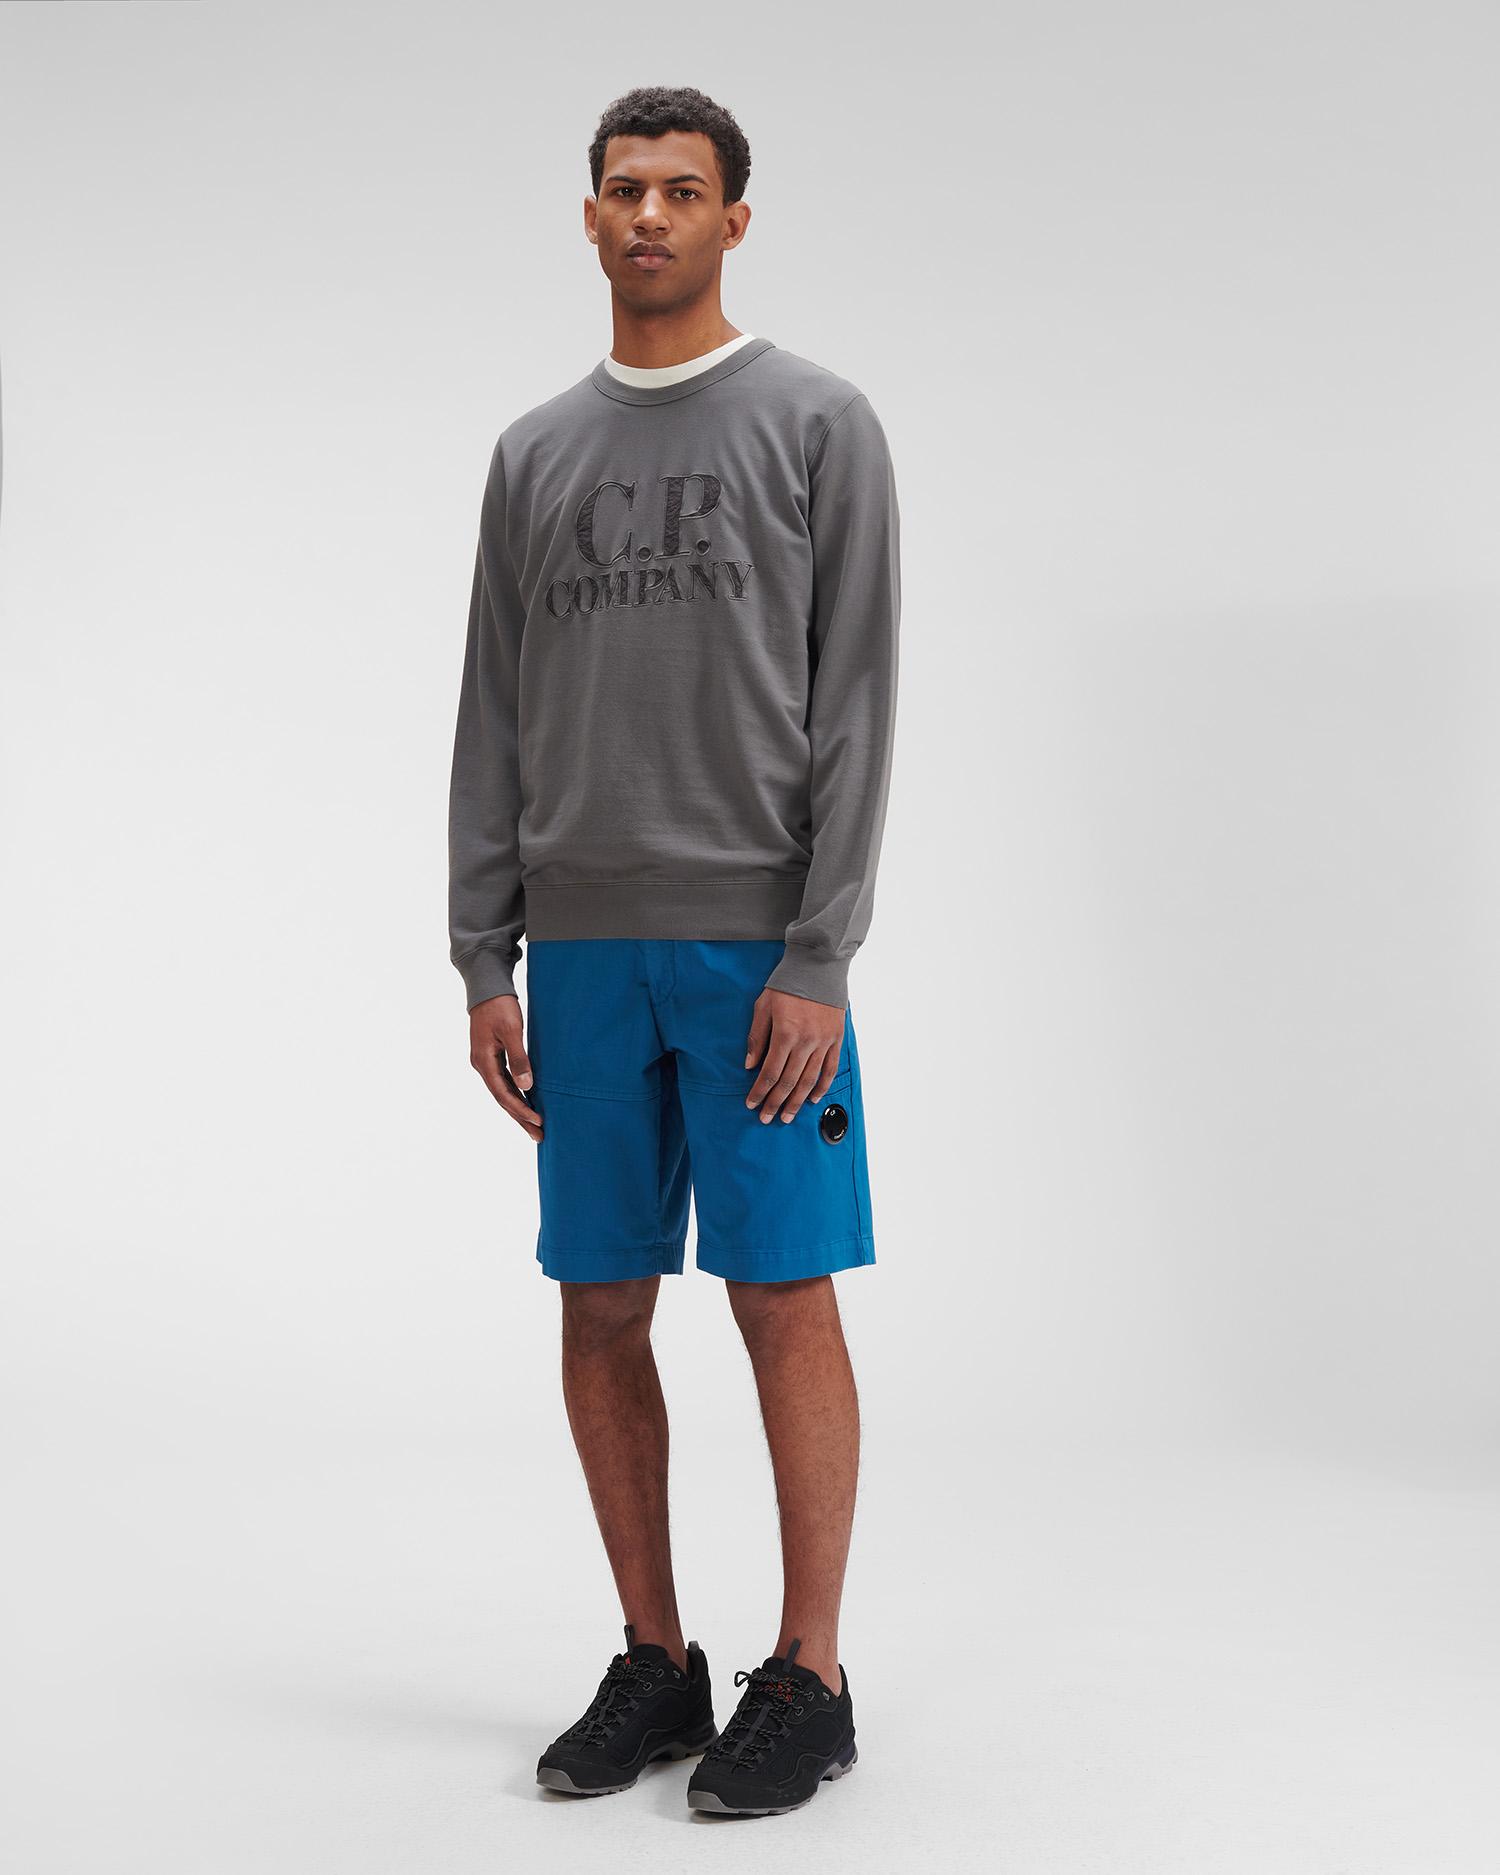 Light Fleece Mixed Garment Dyed Logo Sweatshirt